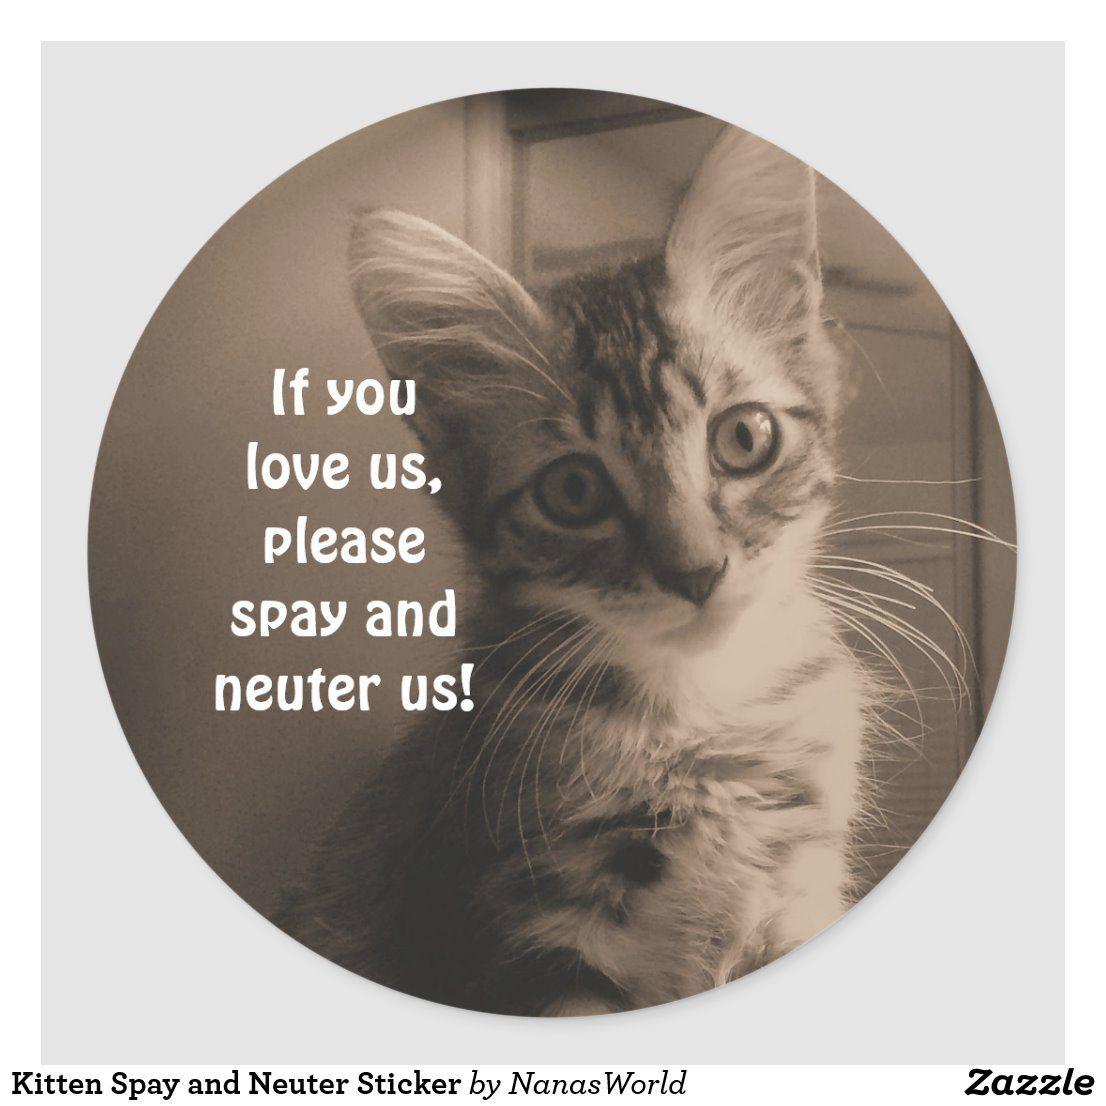 Kitten Spay And Neuter Sticker Zazzle Com In 2020 Spay Neuter Kitten